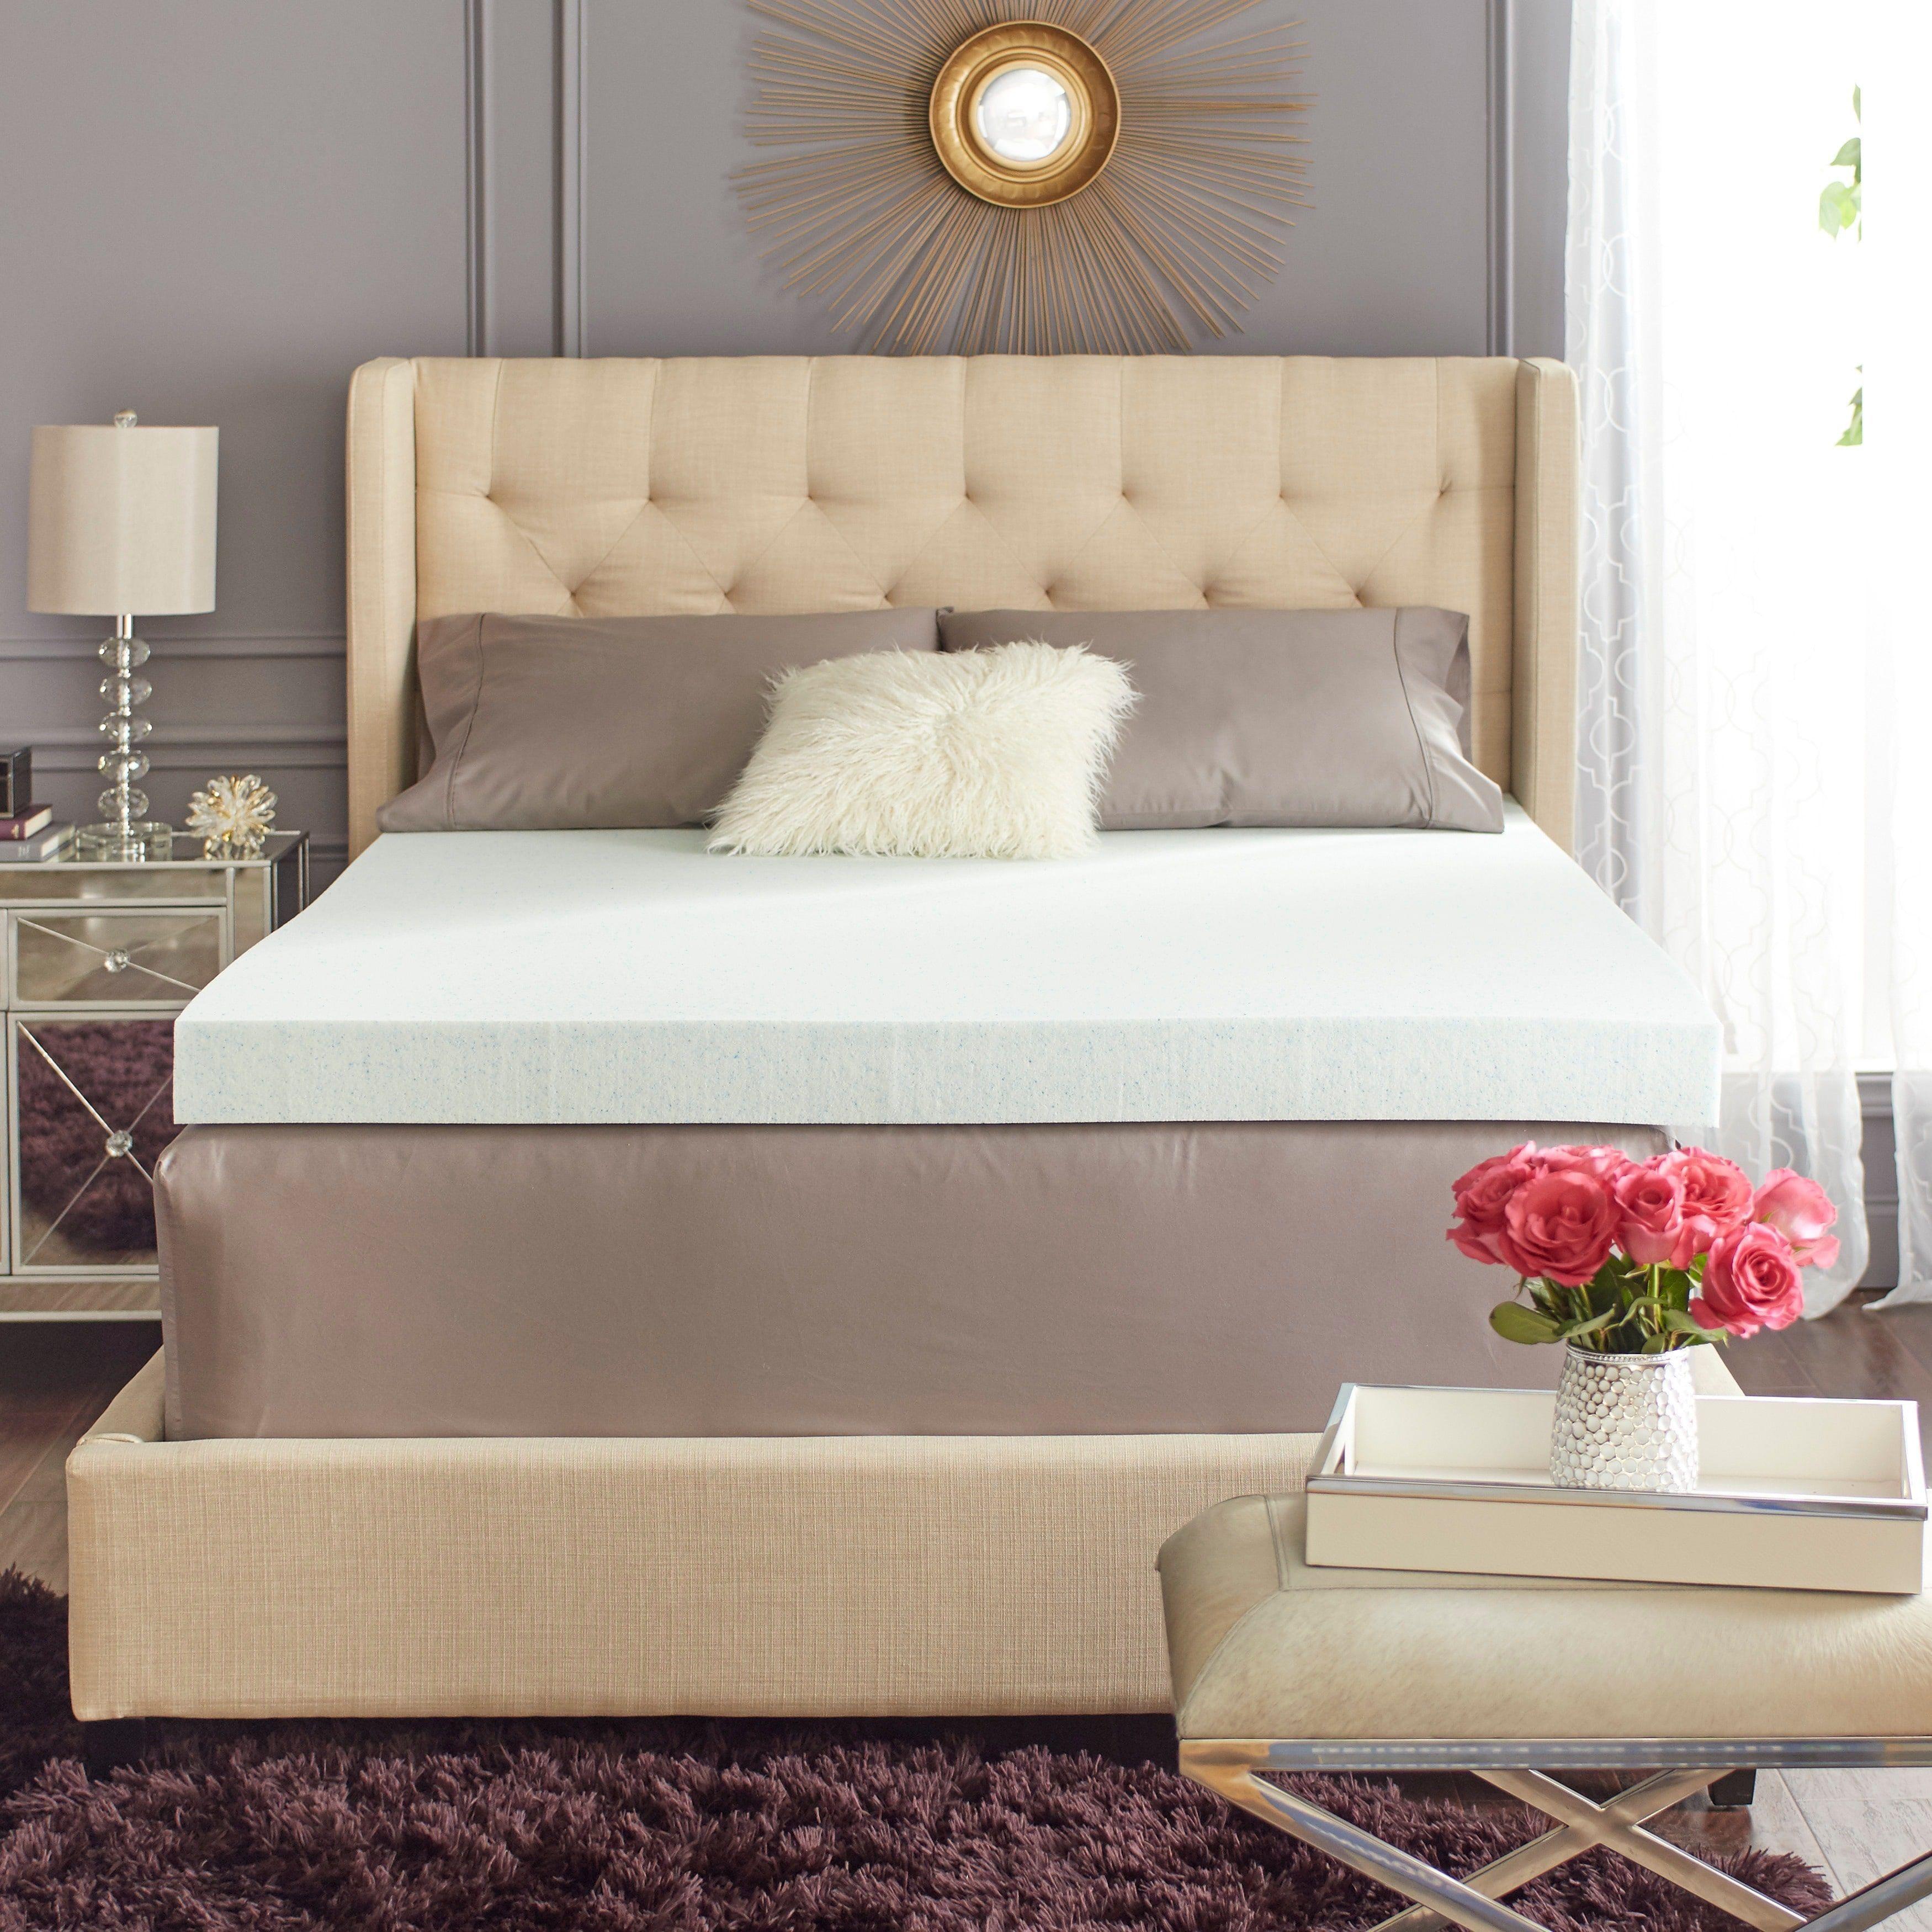 image product uts scl foam memory va click gel full hover topper mattress blended nnpvf over zoom for fingerhut to